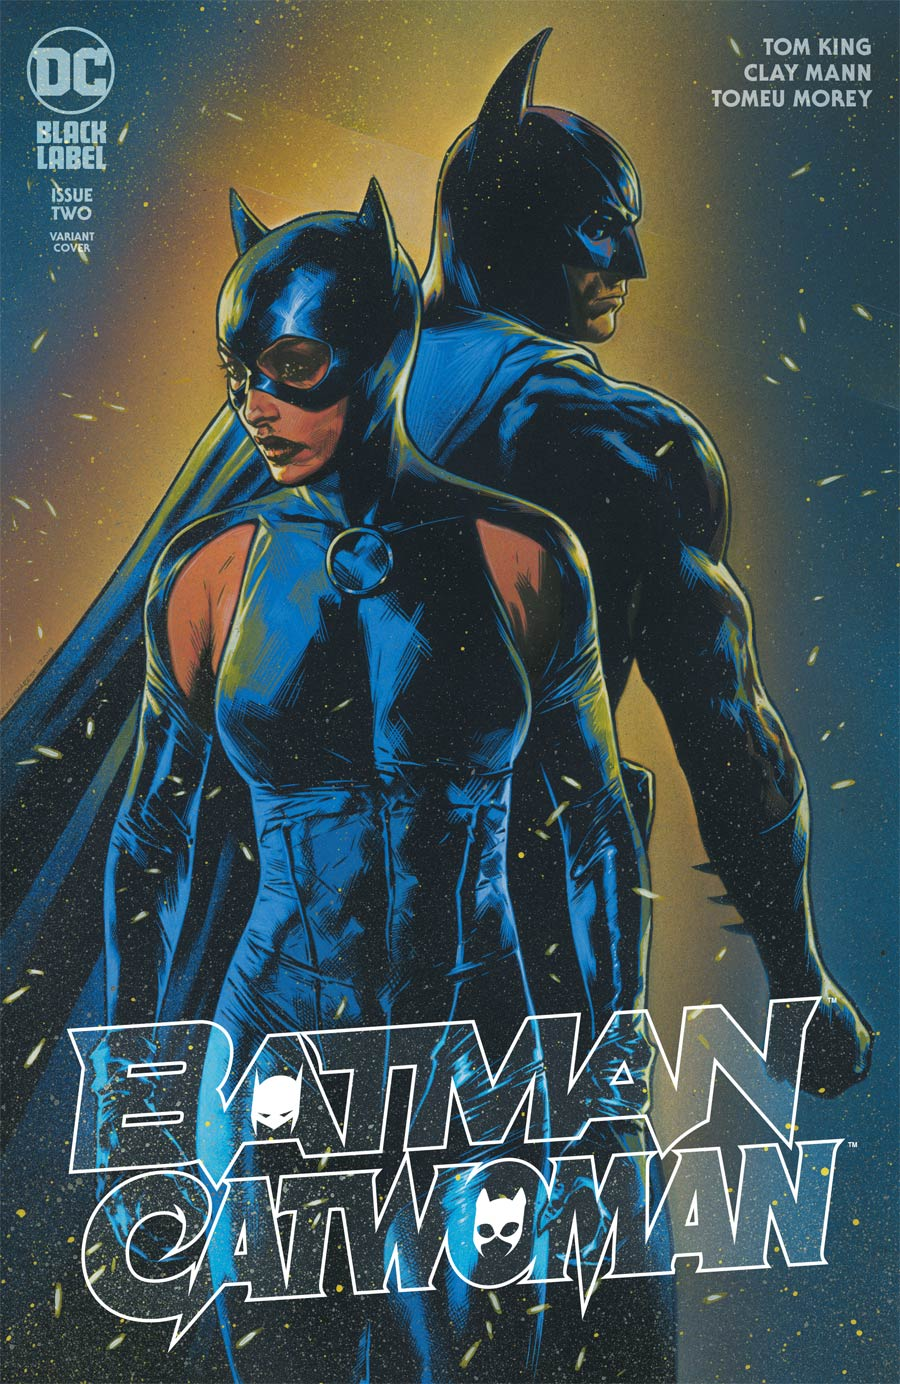 Batman Catwoman #2 Cover C Variant Travis Charest Cover